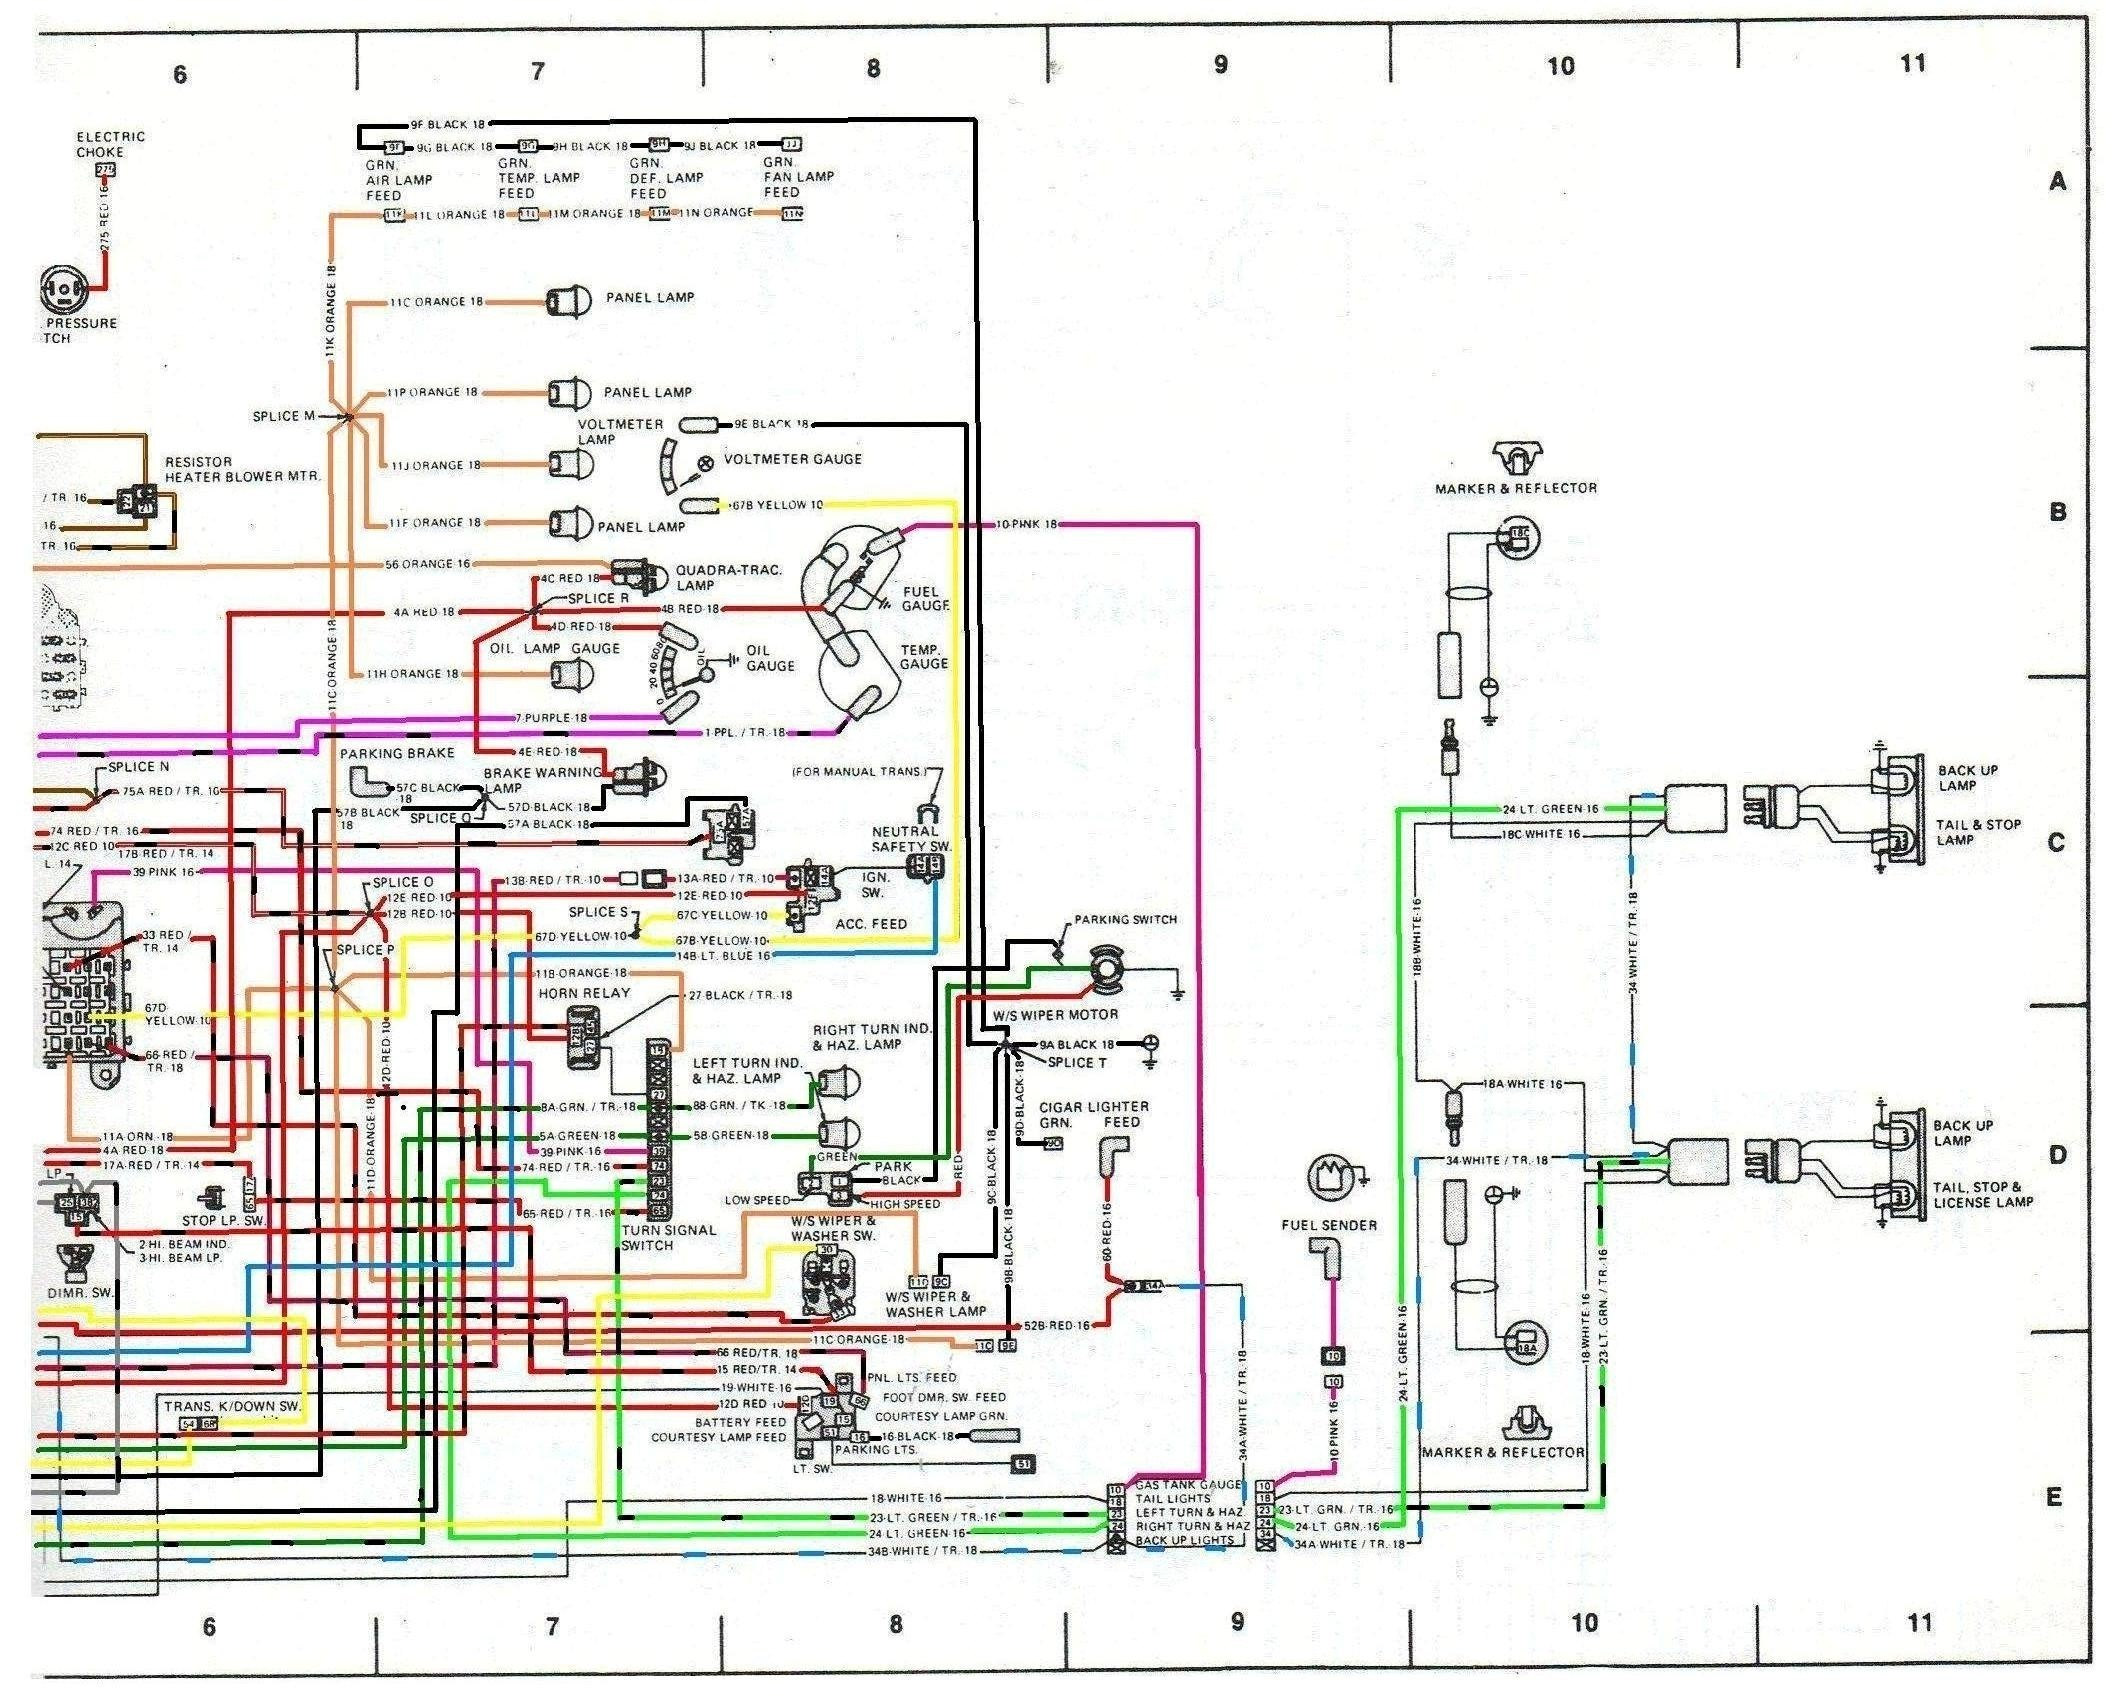 68 Jeep Wiring Harness Diagram - Fuse Box Citroen C4 Grand Picasso for Wiring  Diagram SchematicsWiring Diagram Schematics